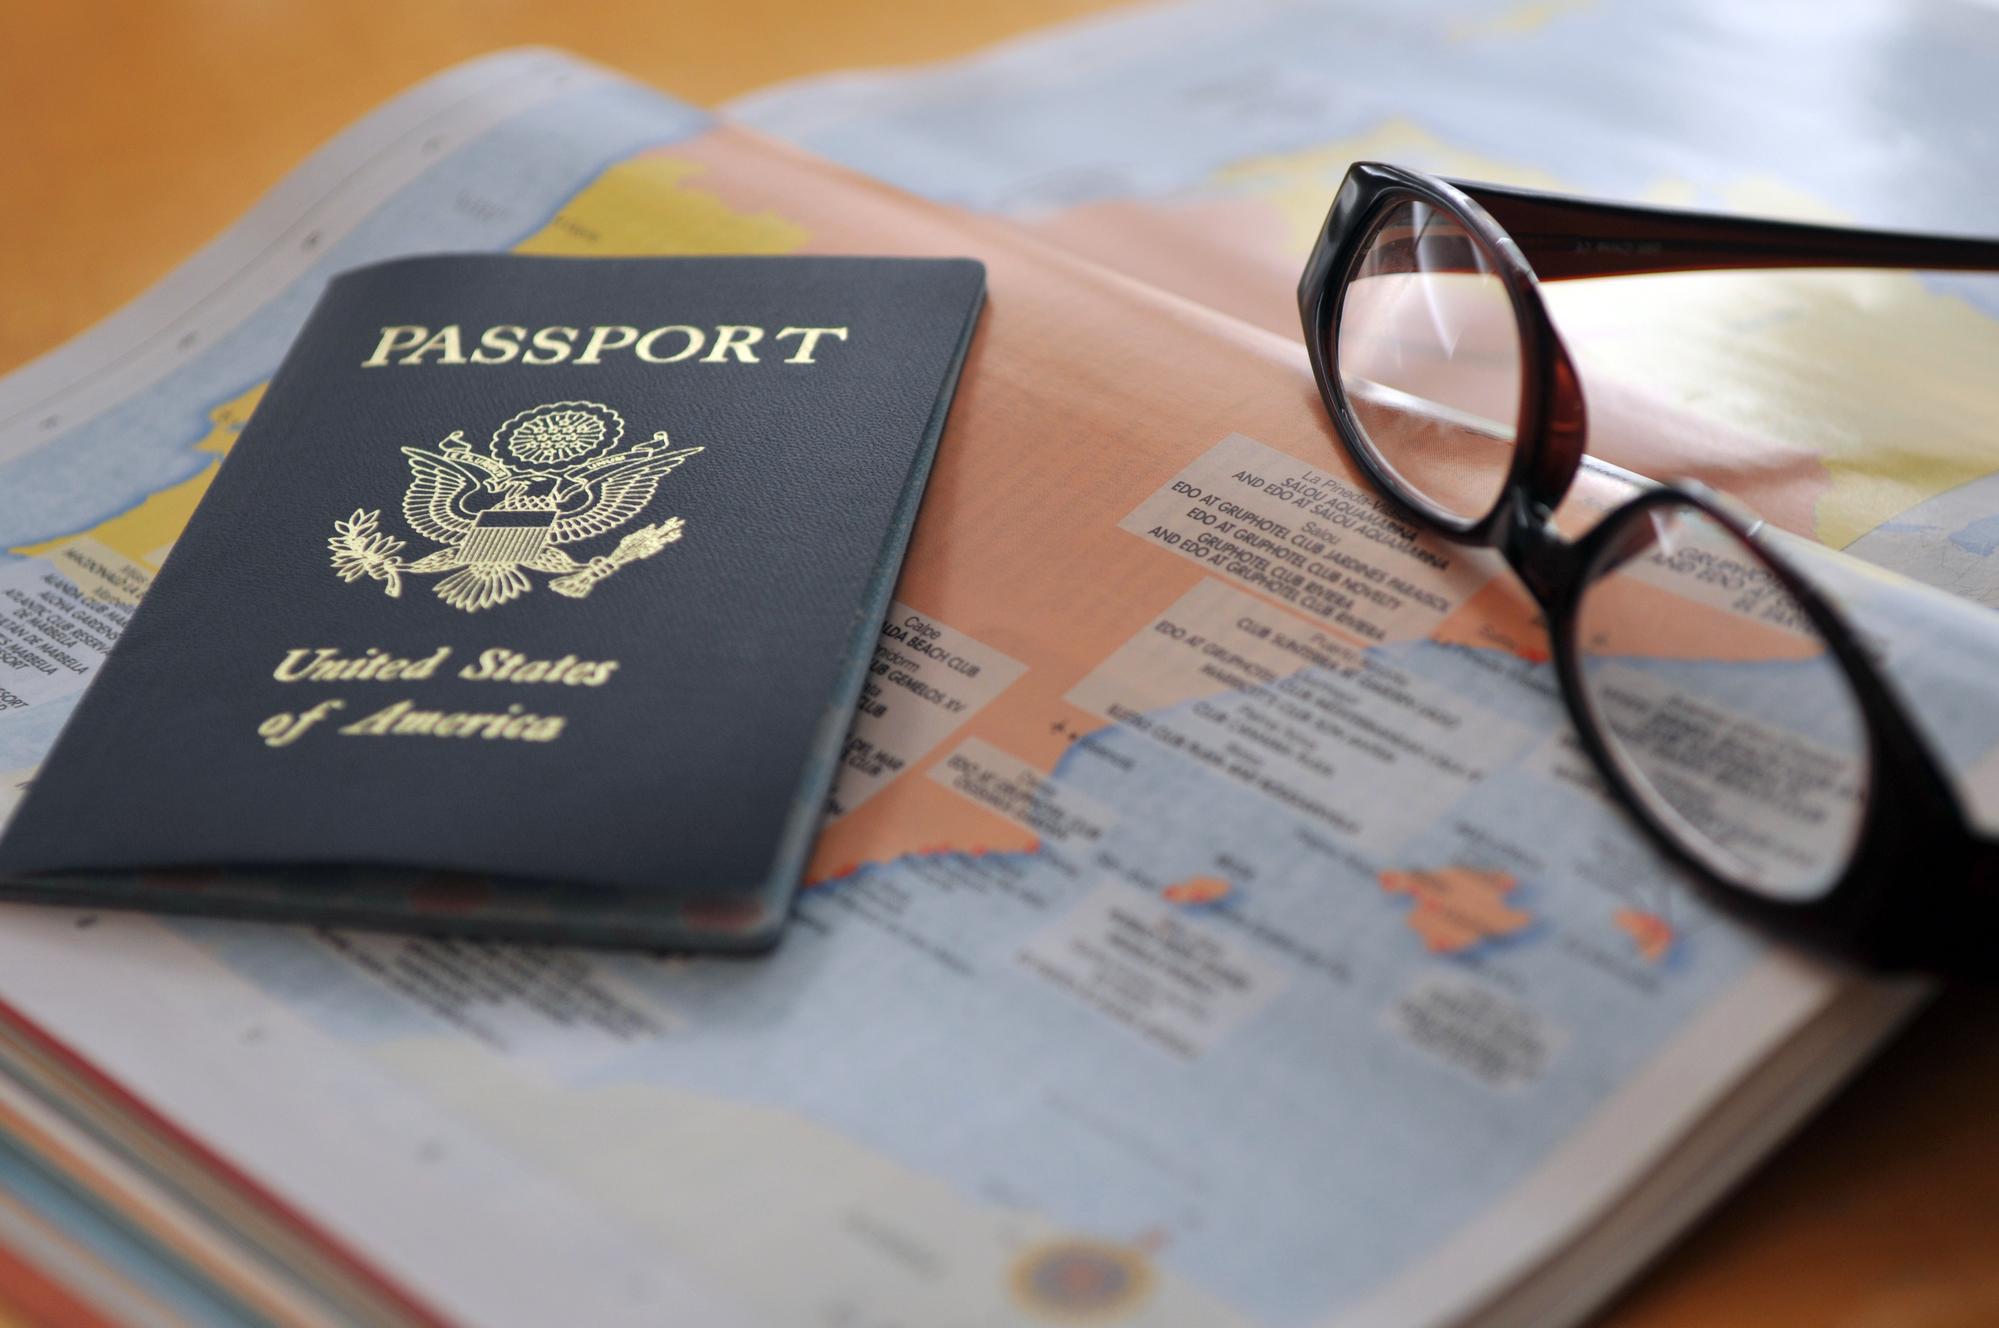 Passport photos no longer allow glasses